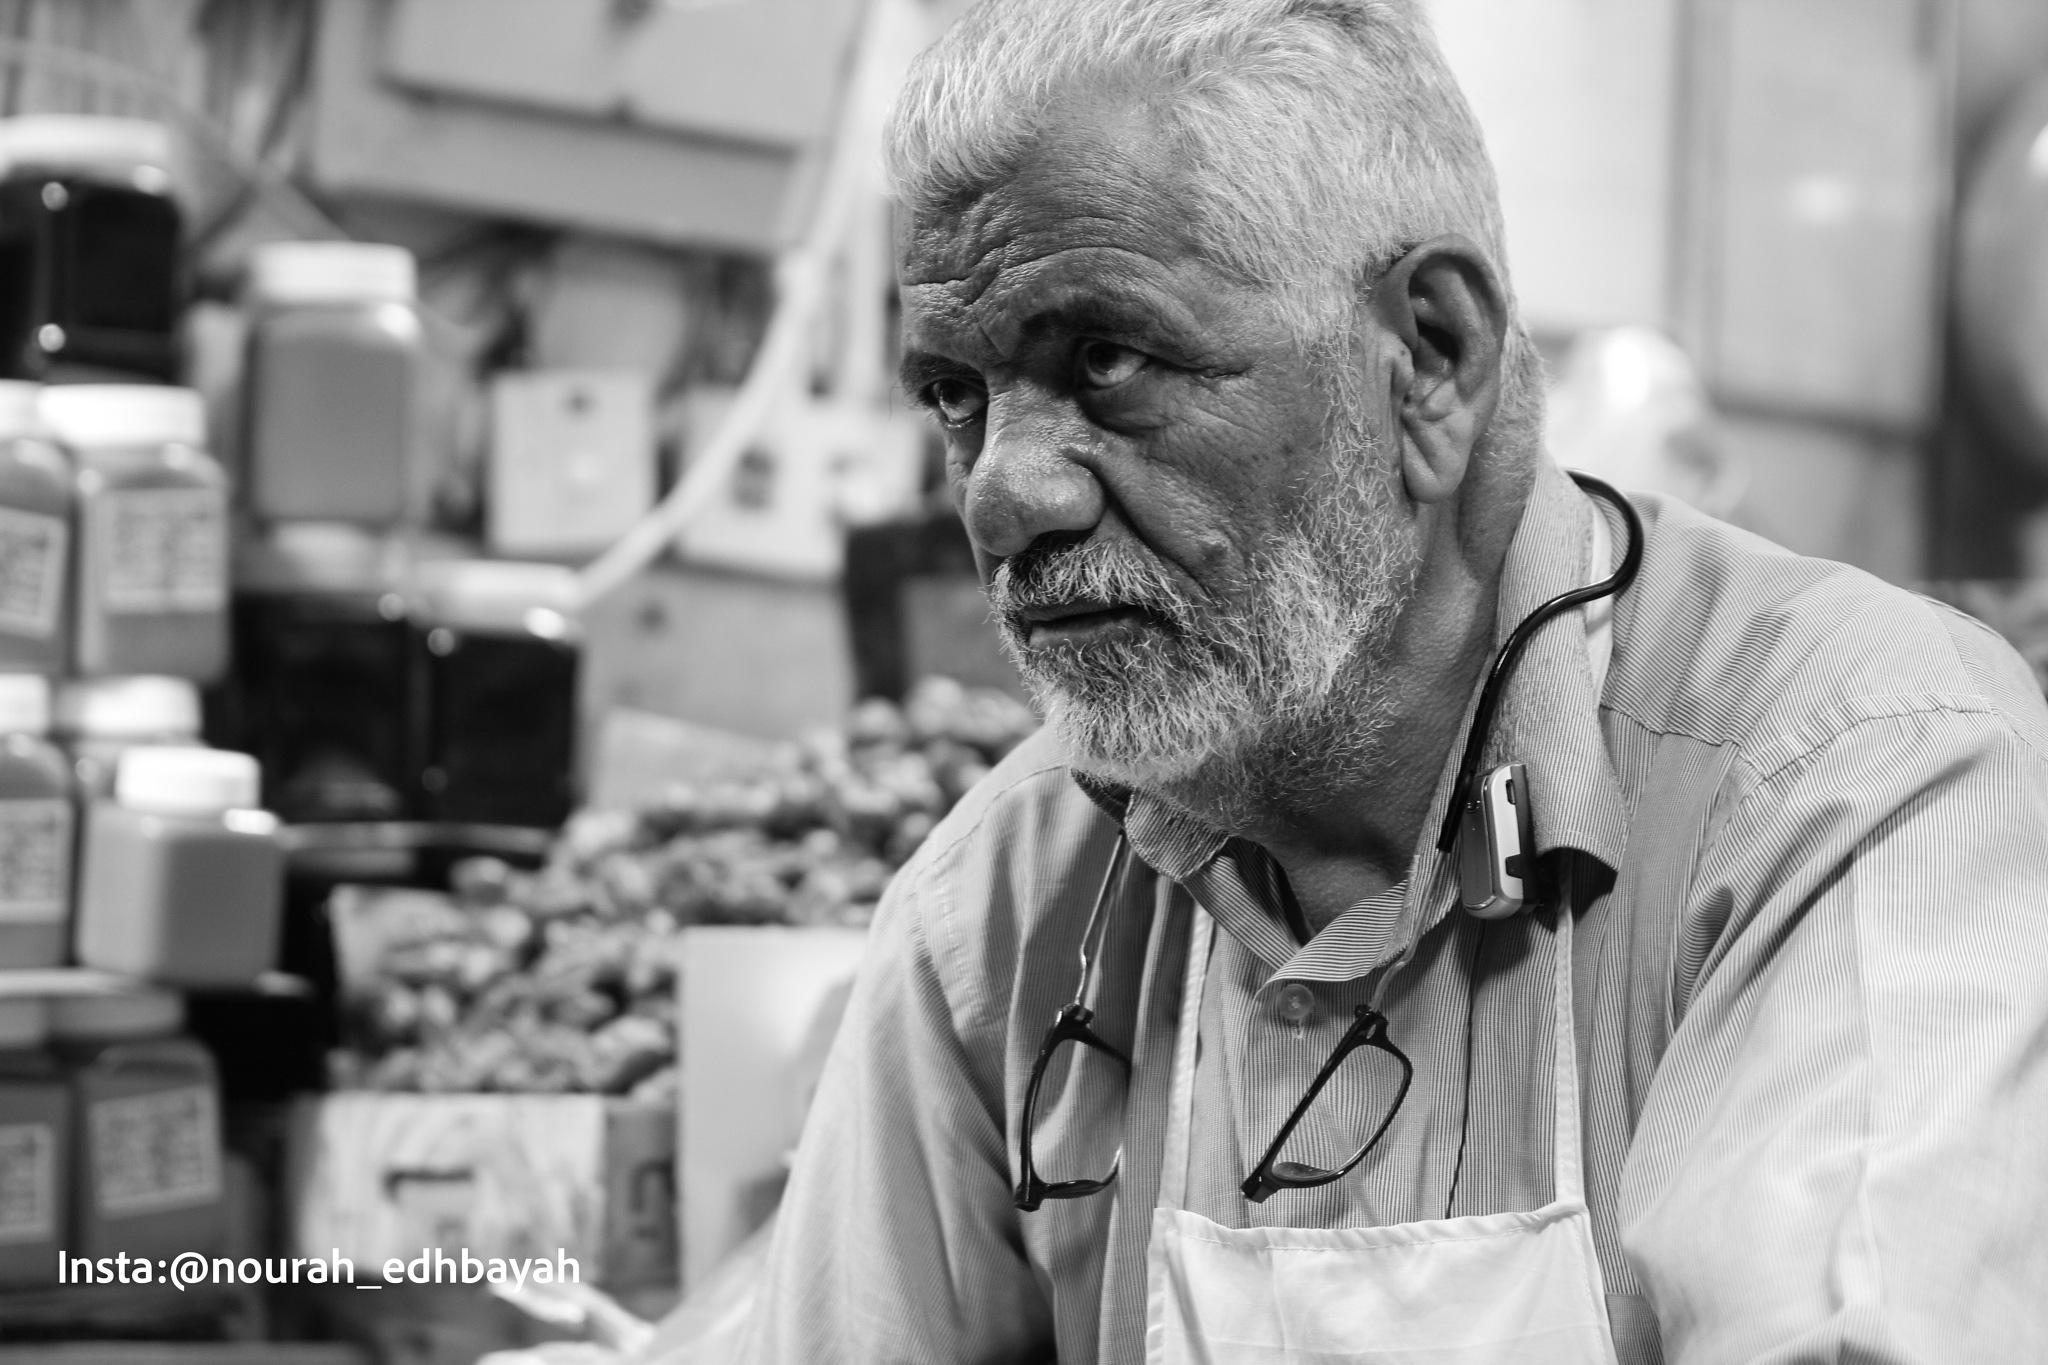 Hard Time by Nourah_Edhbayah